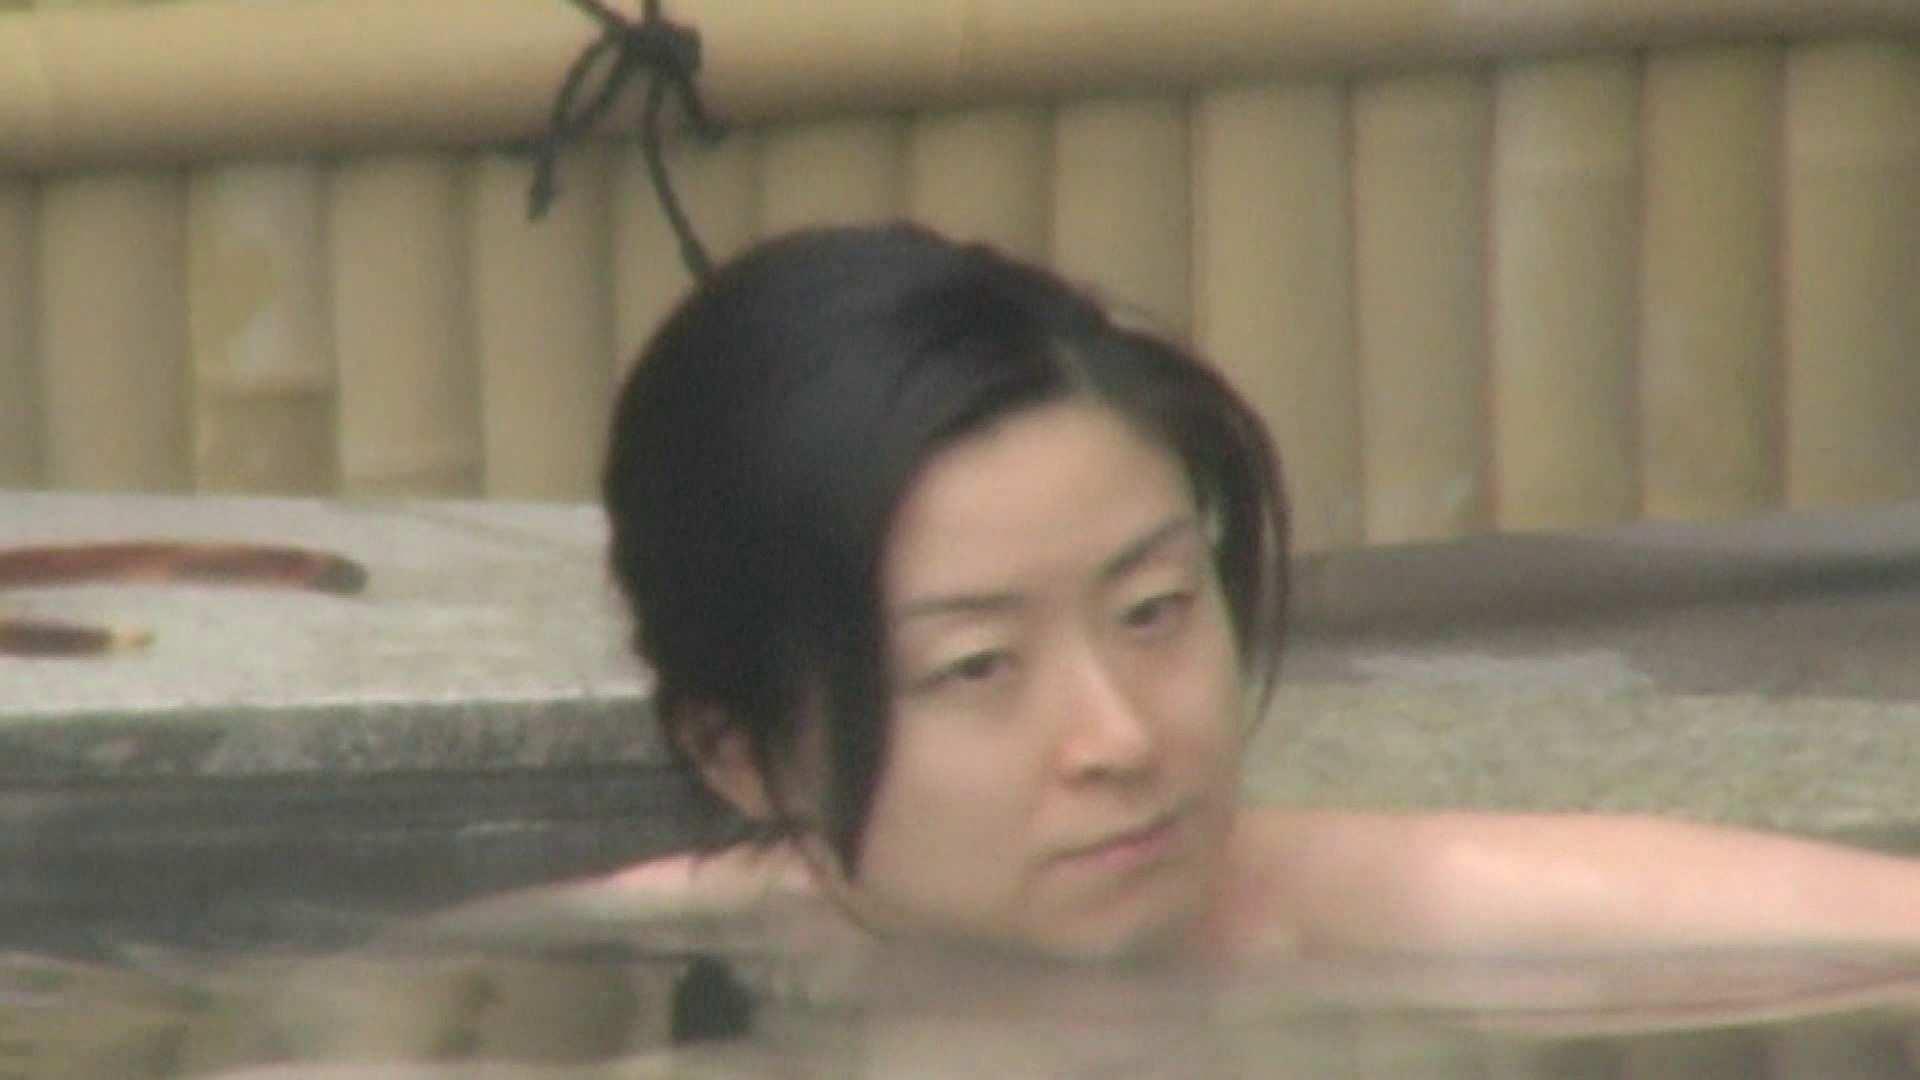 Aquaな露天風呂Vol.548 OLセックス のぞきエロ無料画像 103画像 59